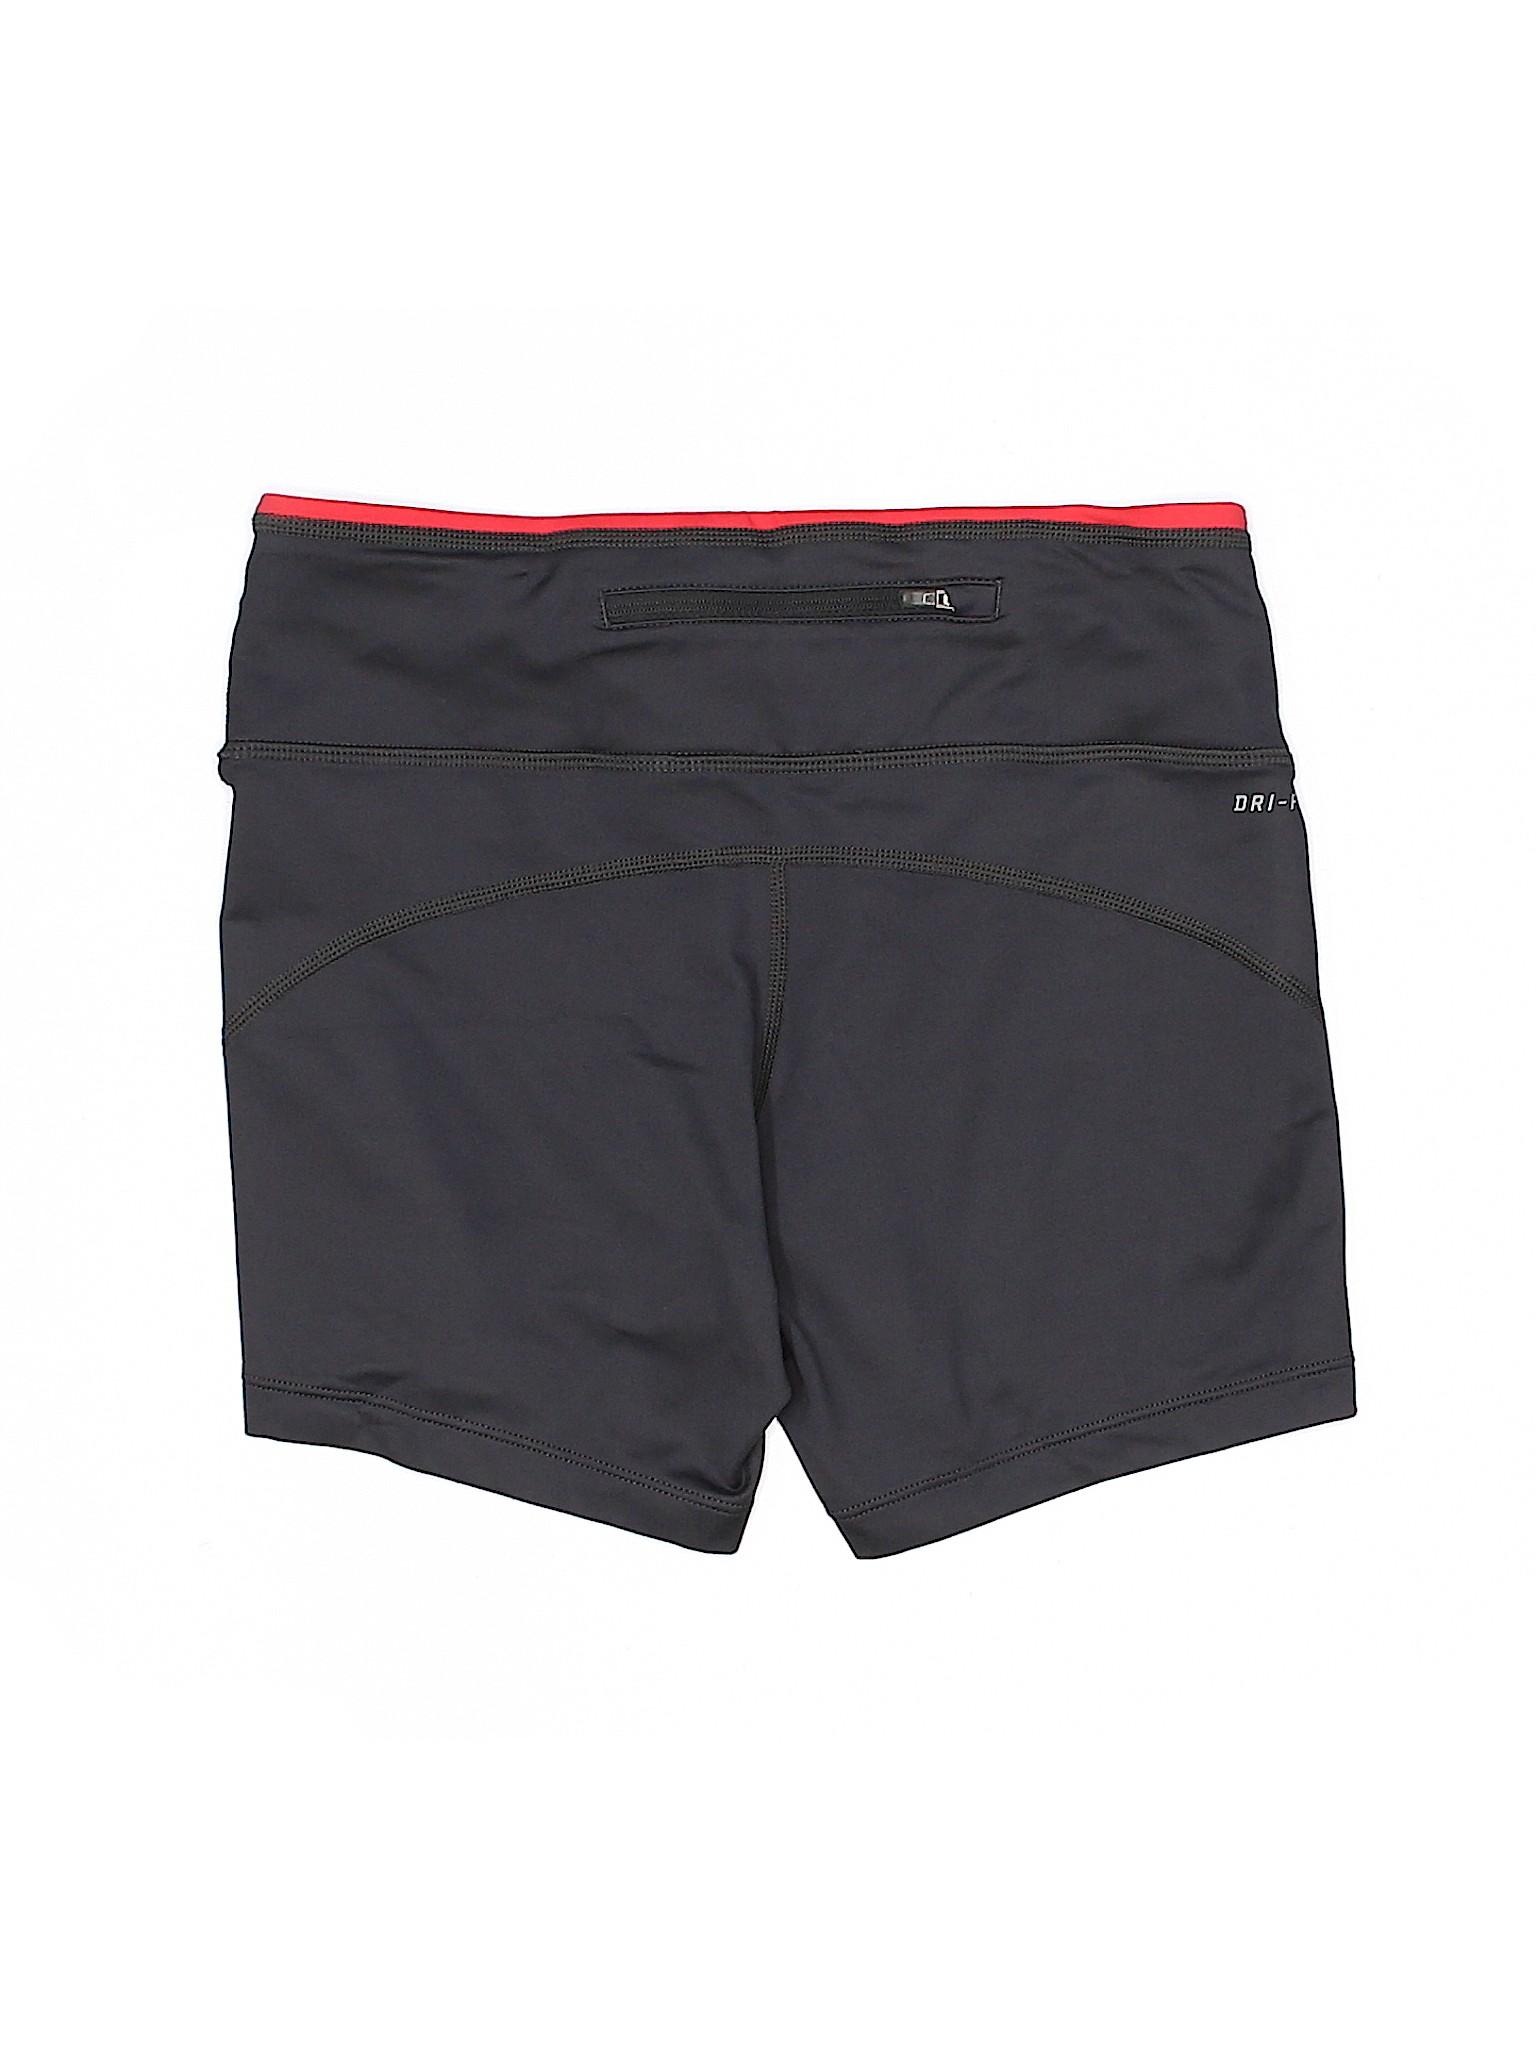 Nike Shorts Boutique Nike Athletic Boutique Shorts Athletic Nike Boutique Athletic p1wvBqq